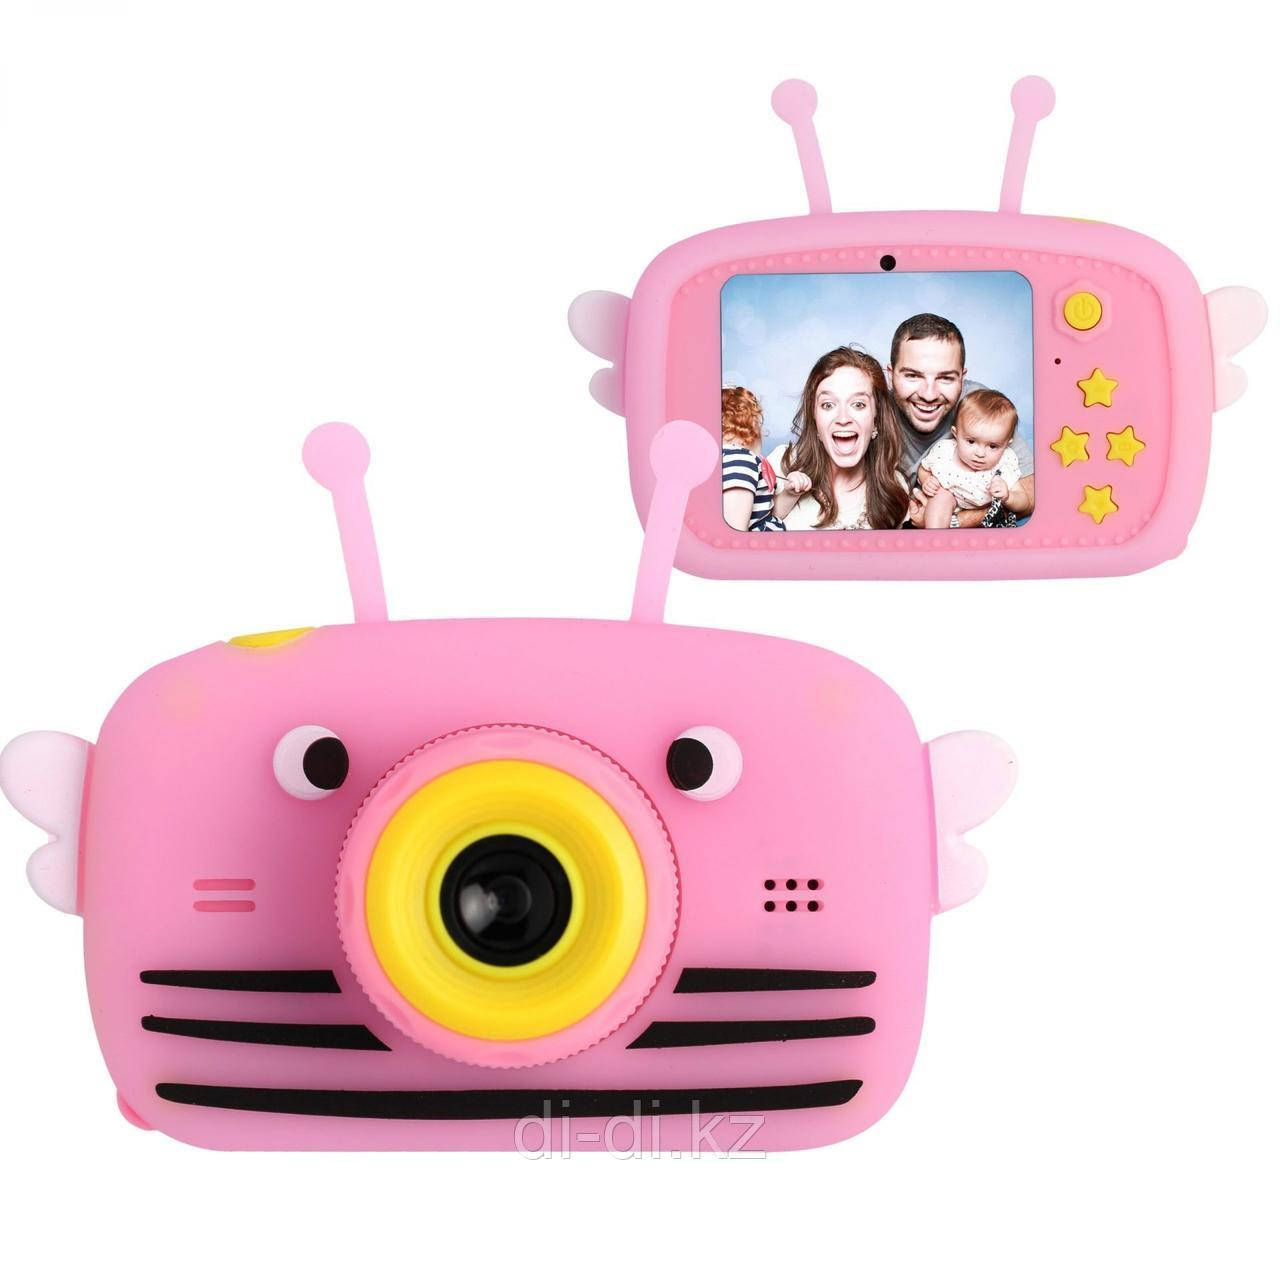 Детский цифровой фотоаппарат Пчелка Children's Fun Camera Bee